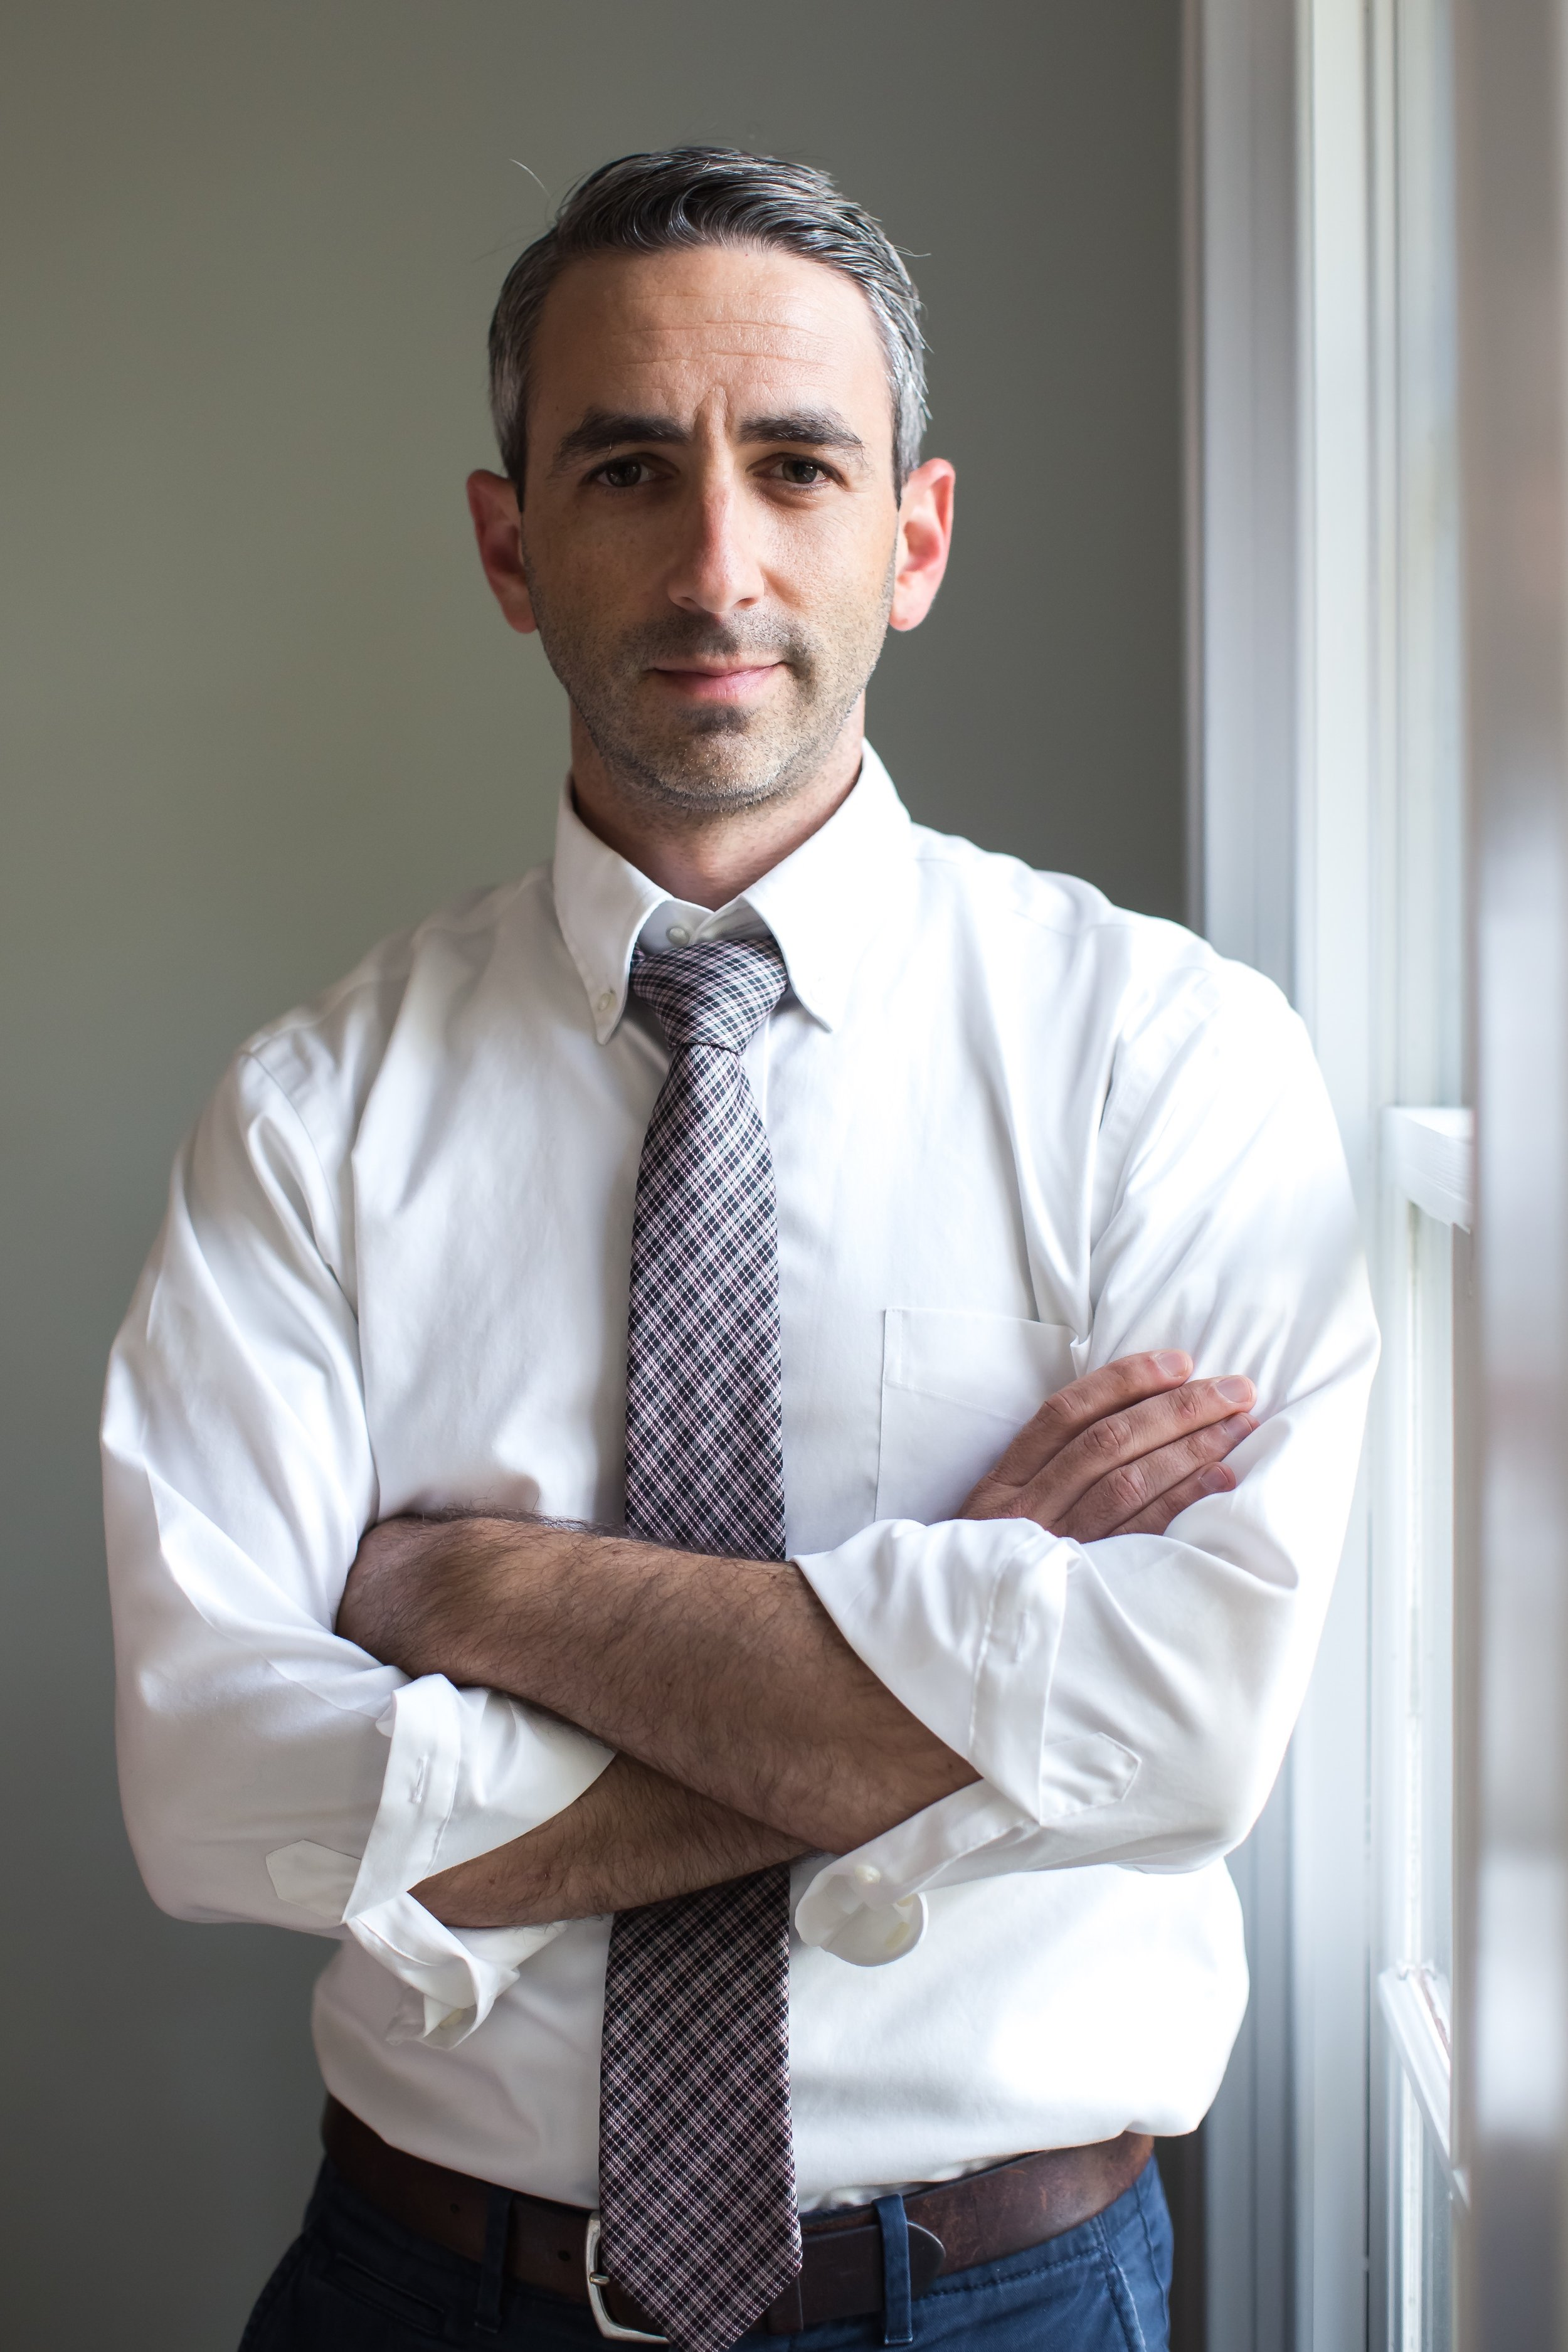 Matthew Kayser, MD,PhD   Assistant Professor